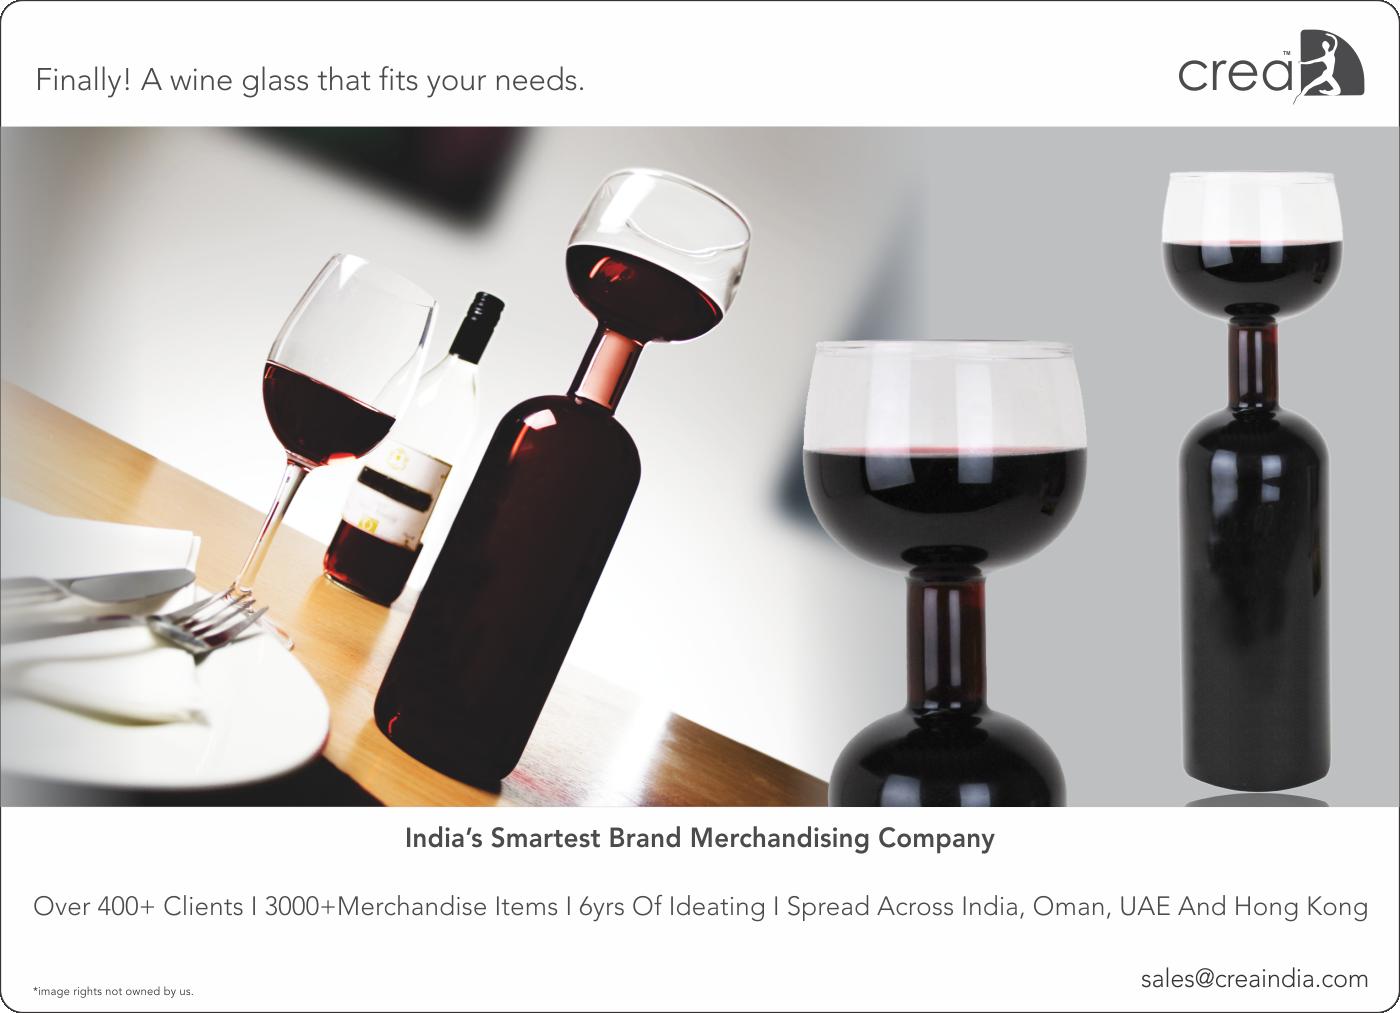 Wine Bottle cum Glass from Crea. India's smartest brand ...